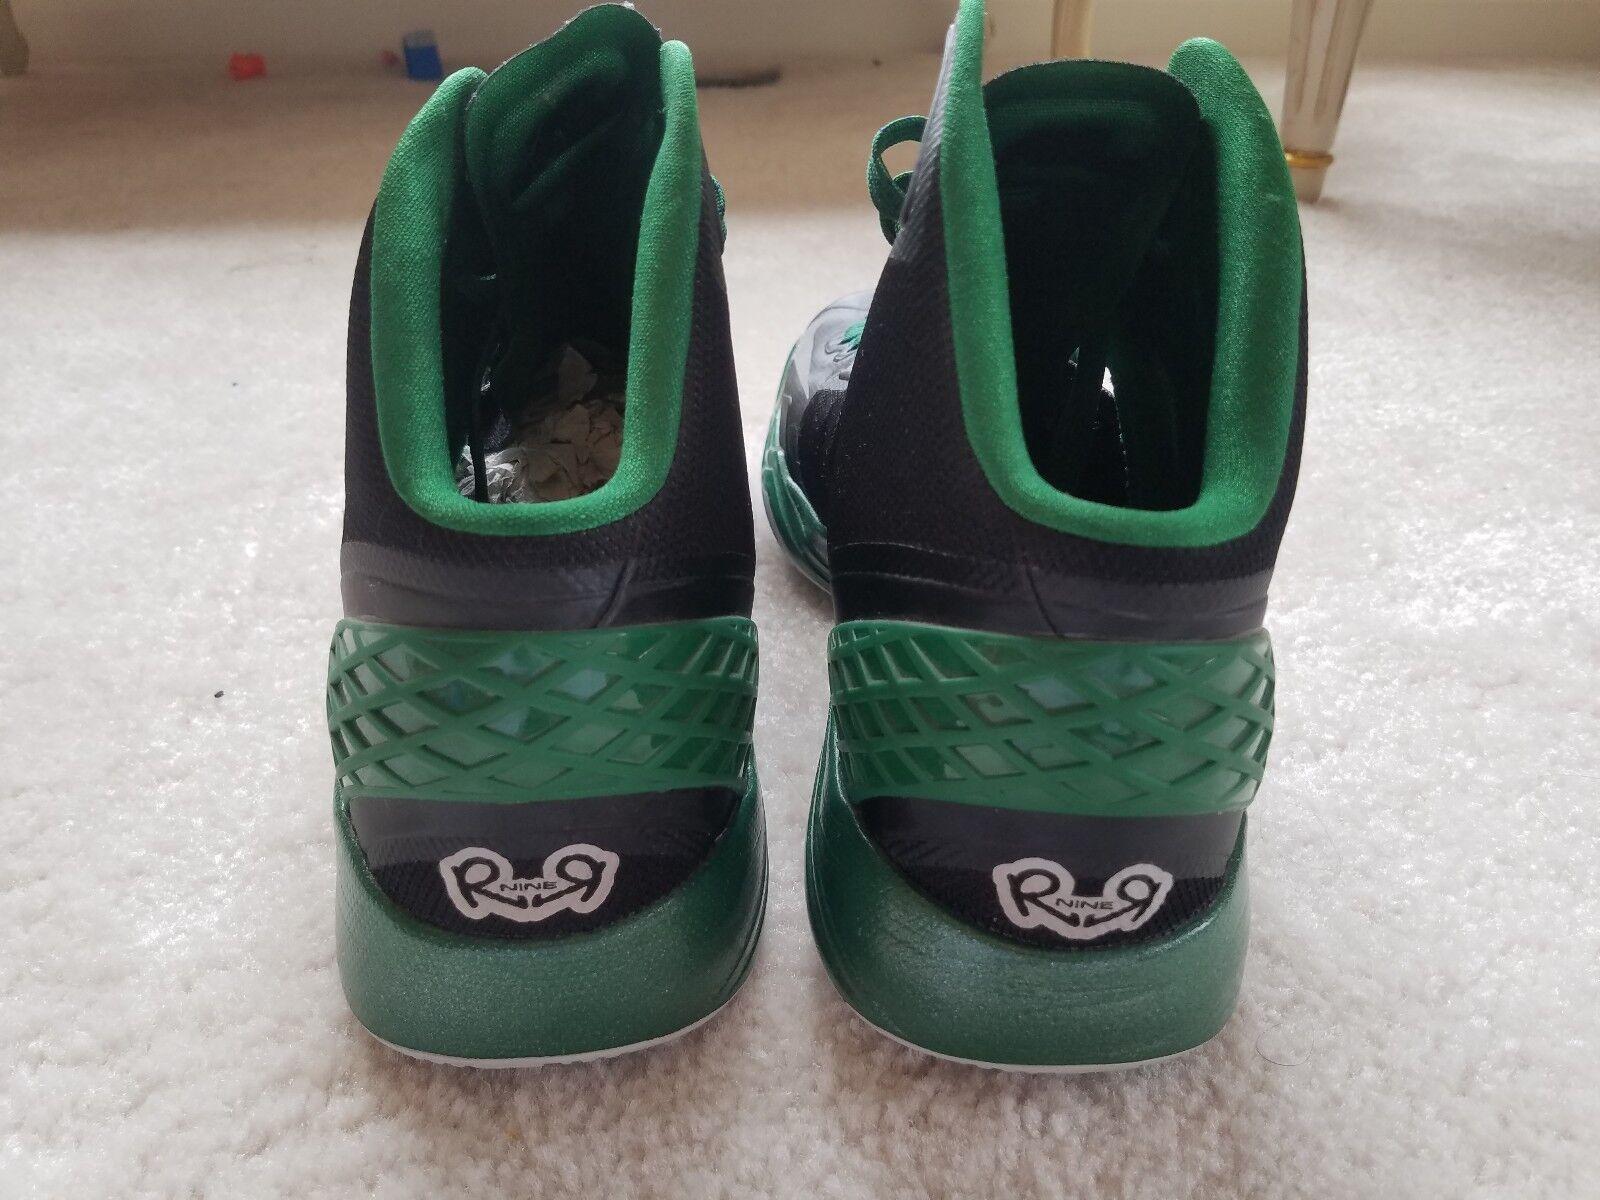 Nike Zoom Rajon Hyper disruptor PE Rajon Zoom Rondo promo muestra Celtics... único par en eBay Wild Casual Shoes 943bb5